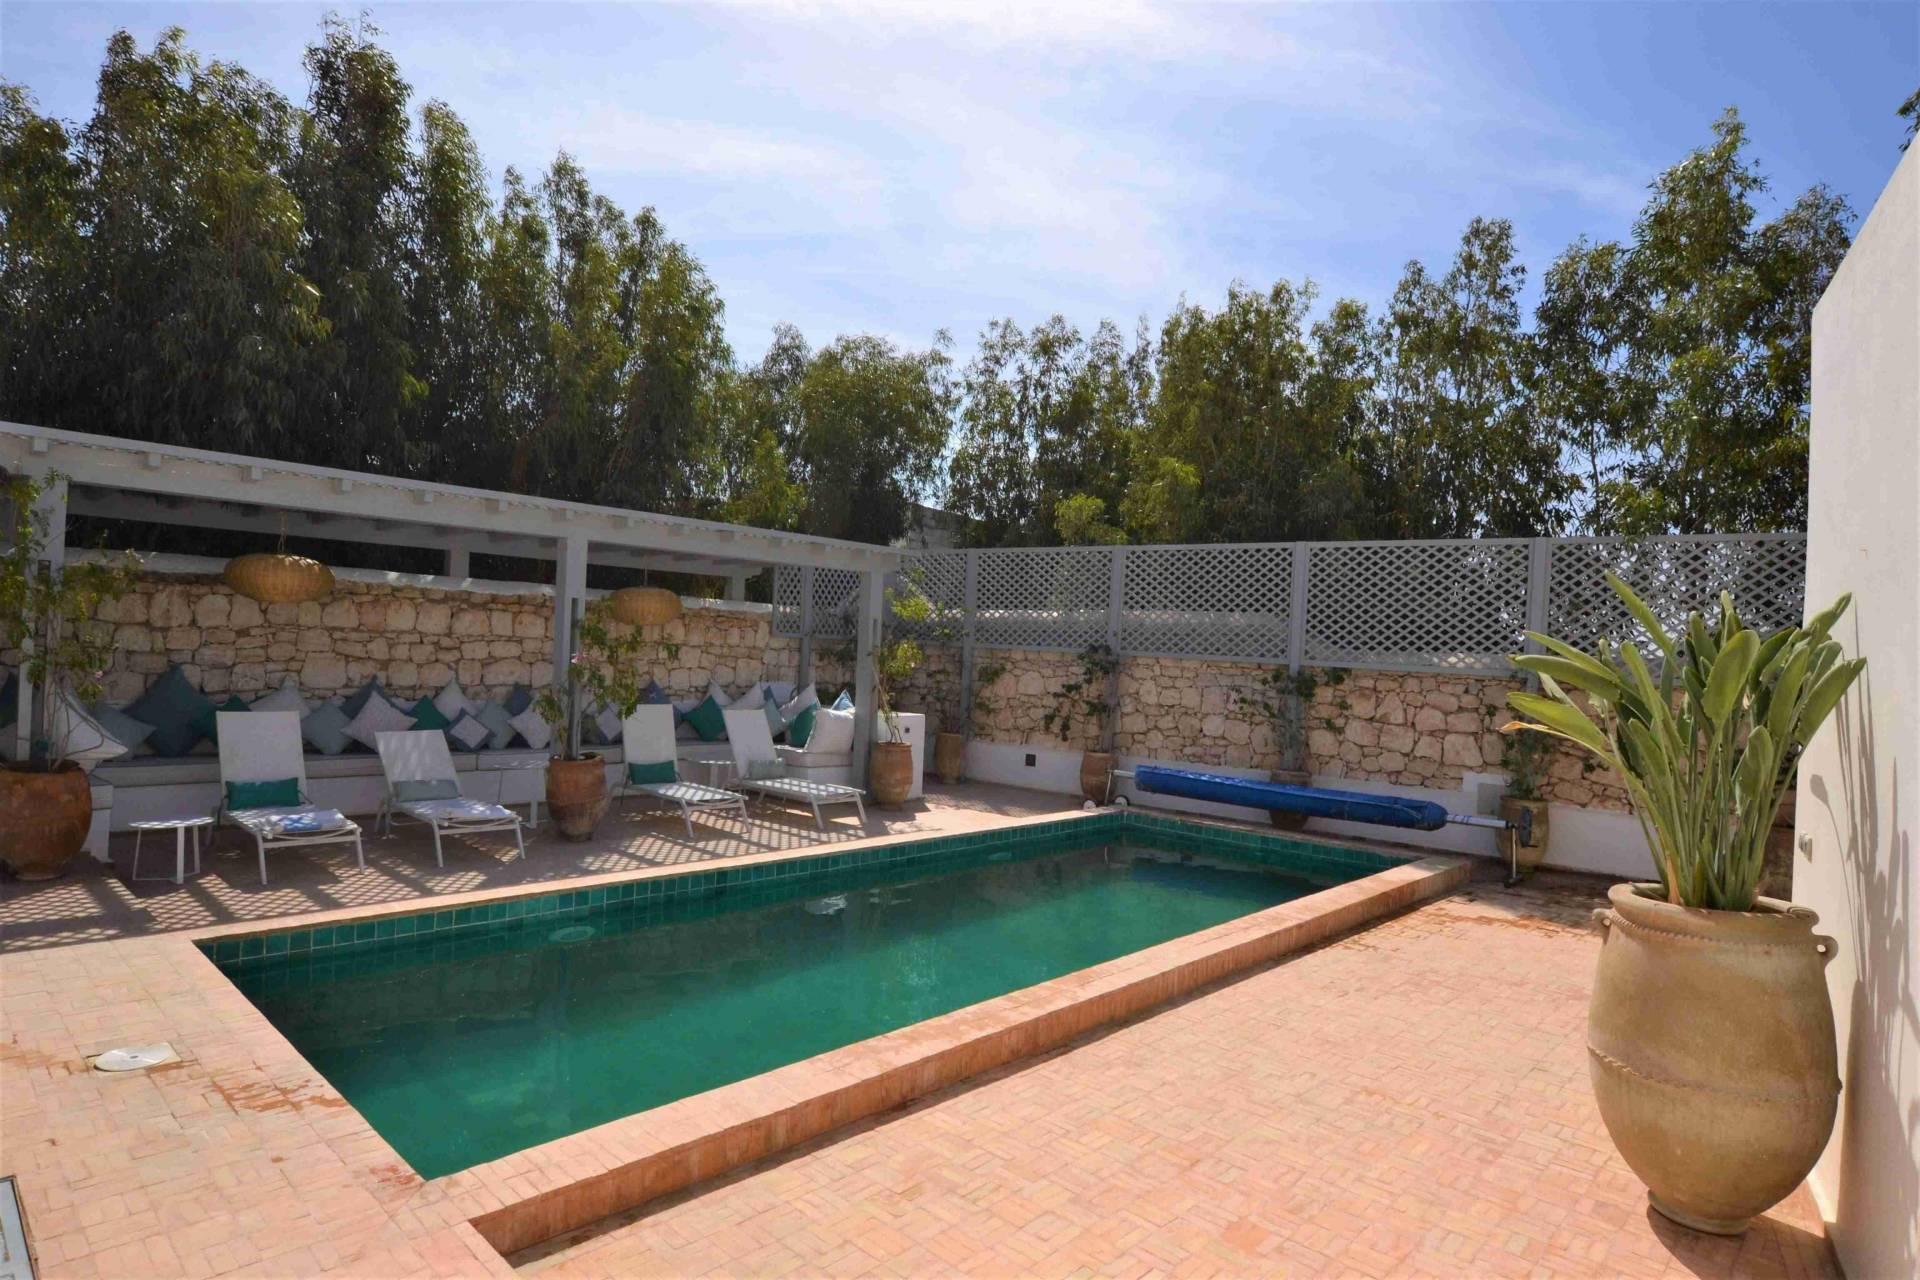 Vente - Maison de campagne - Campagne - 200 m² - 320000 € - Essaouira - 9234